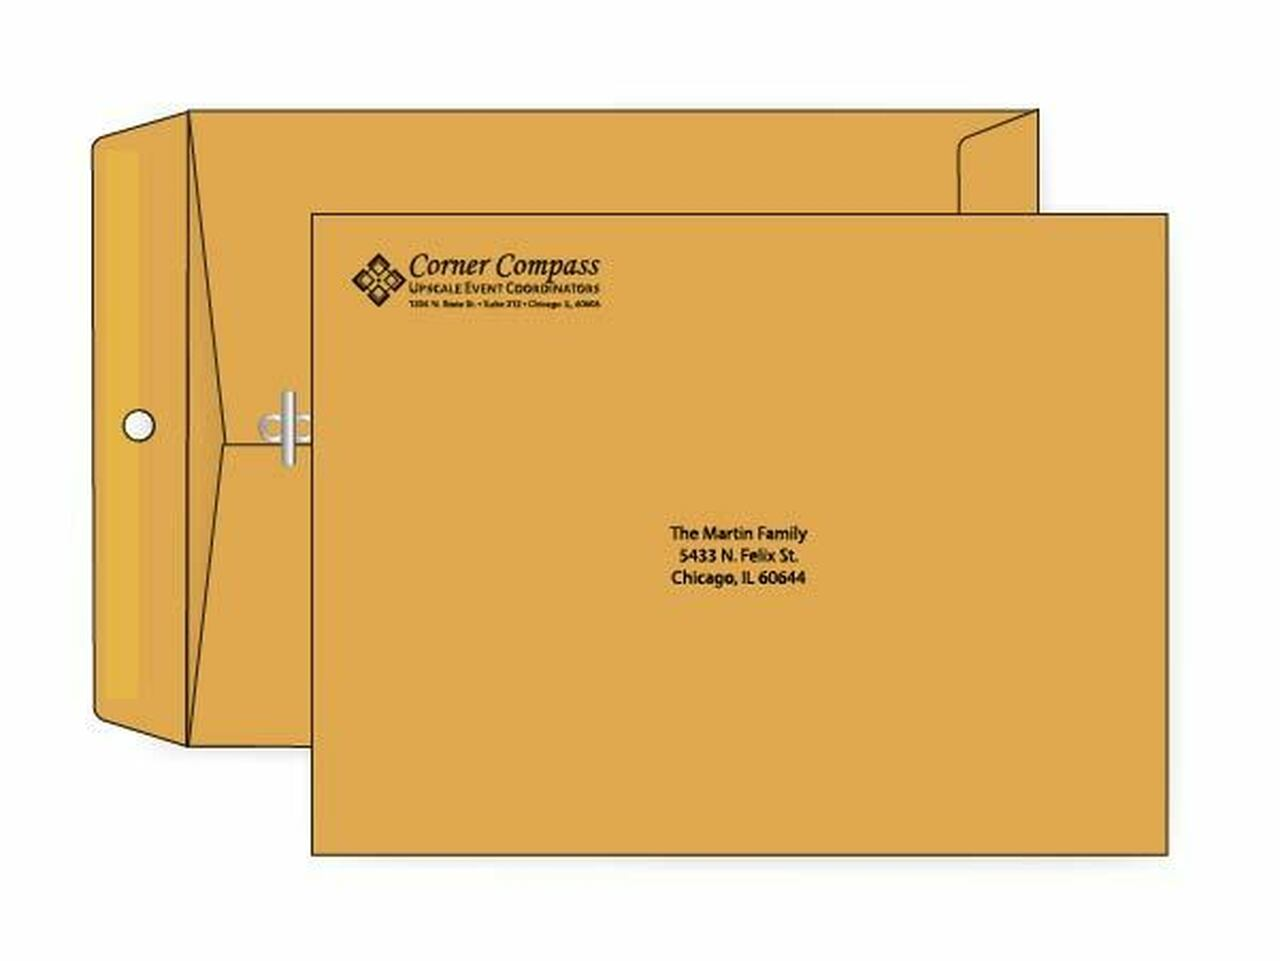 PRINTED - Custom 9x12 Clasp Envelopes - EN1016